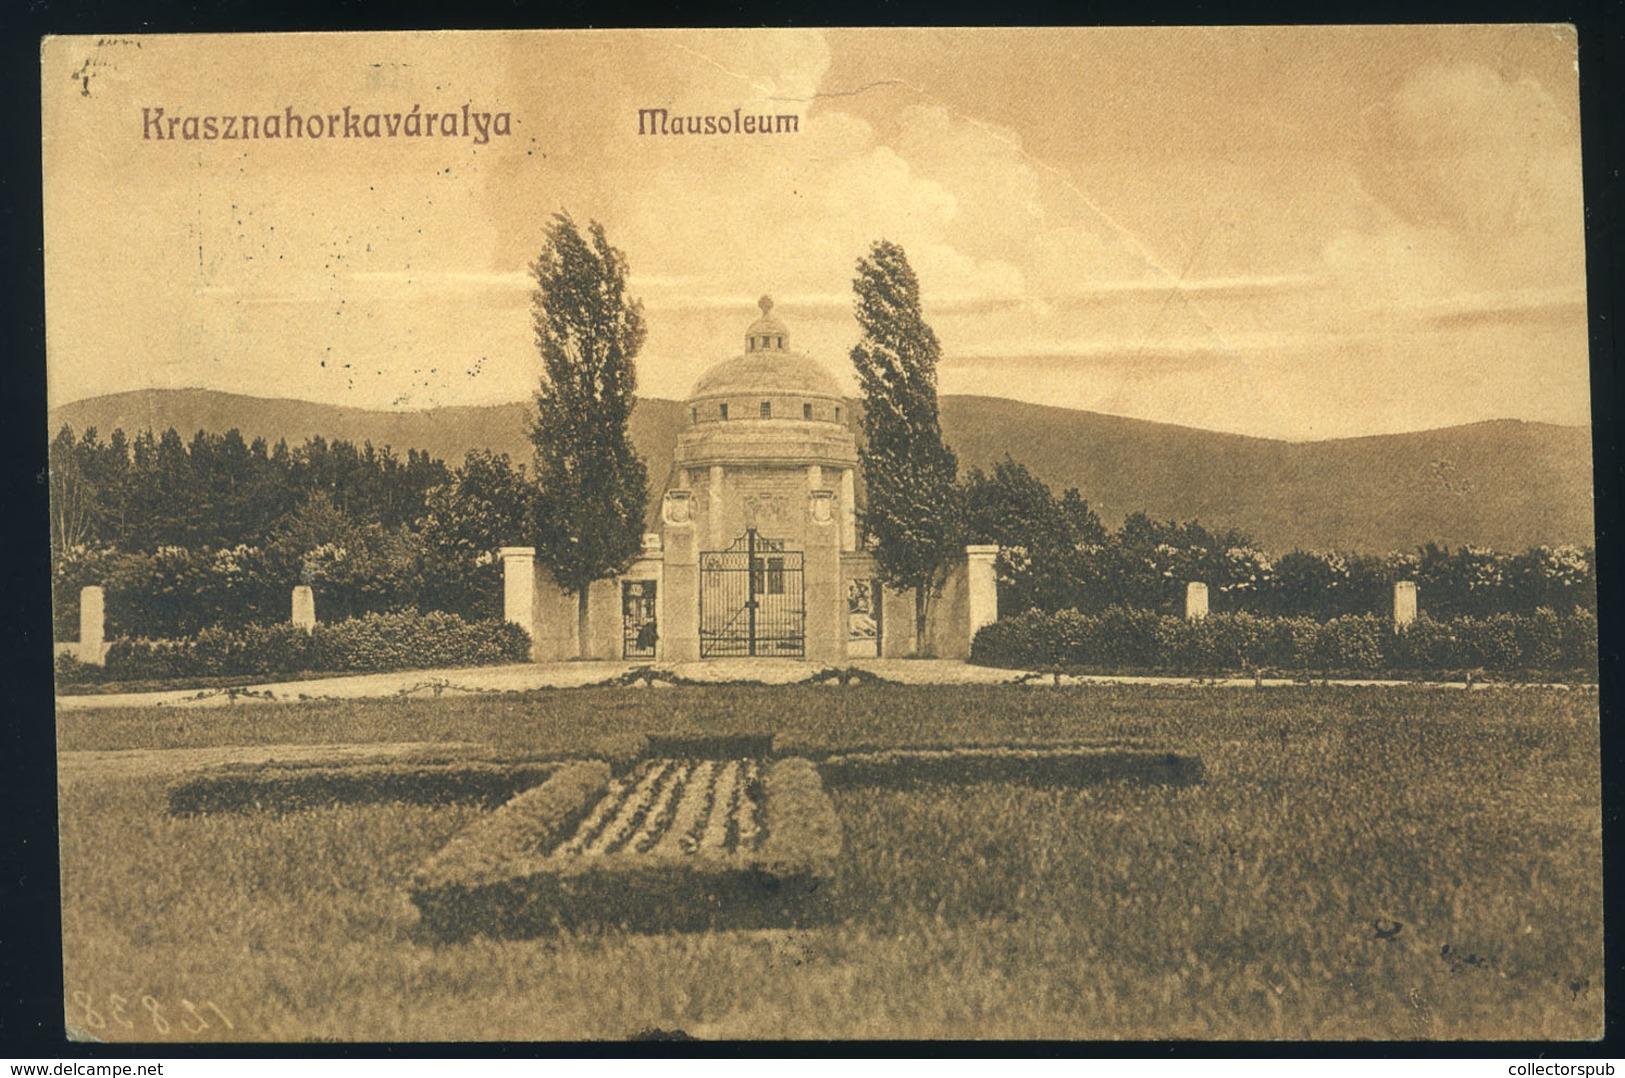 89826 KRASZNAHORKAVÁRALJA 1913 Régi Képeslap  /  KRASZNAHORKAVÁRALJA 1913 Vintage Picture Postcard - Hungary